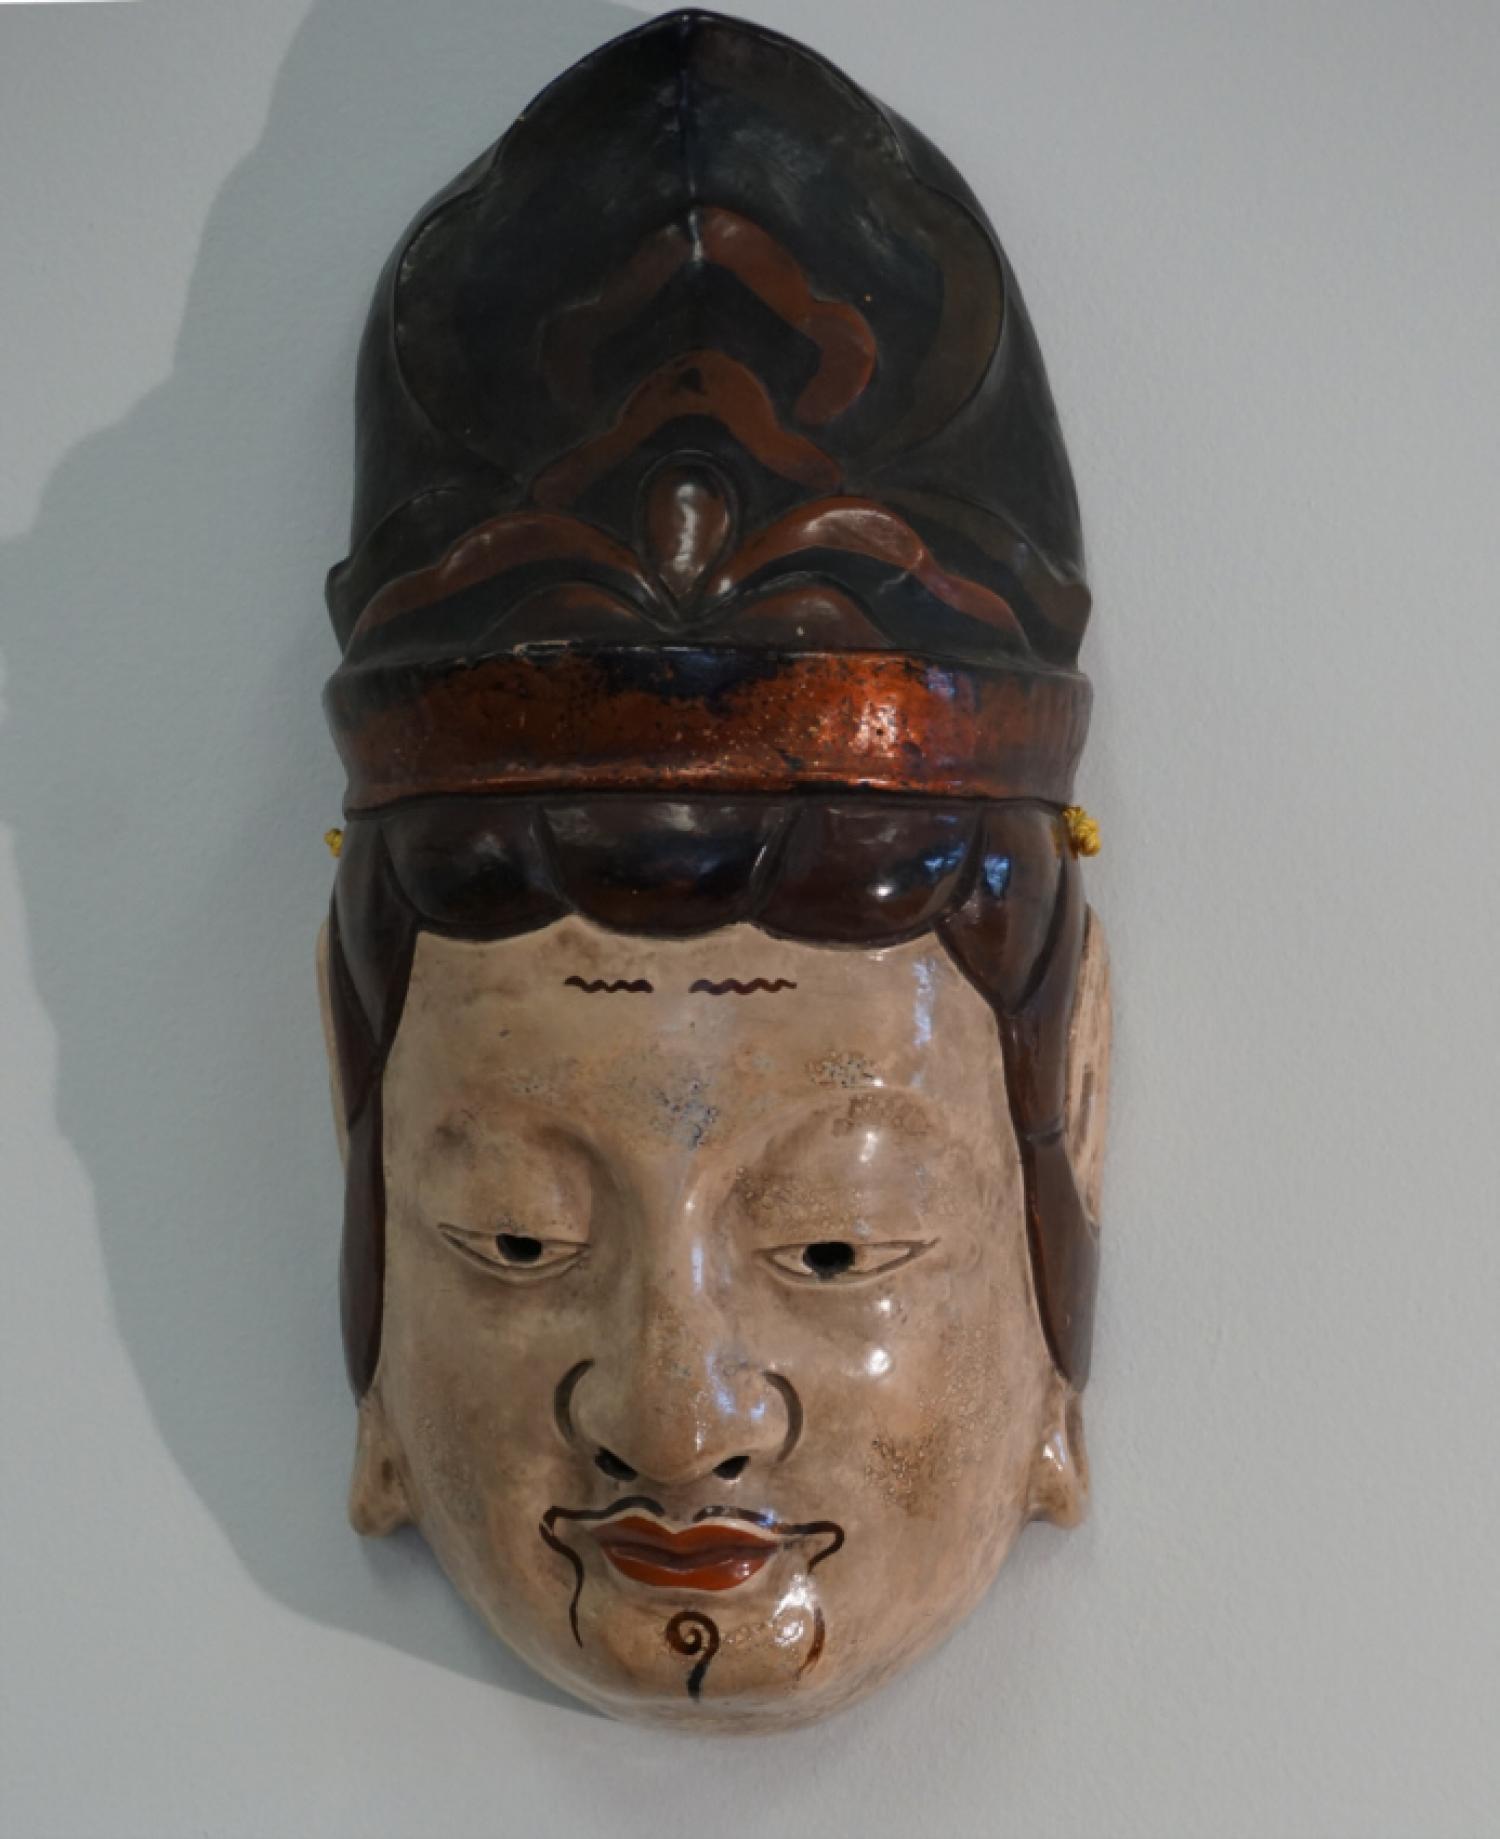 Japanese Meiji period ceremonial noh mask c1860